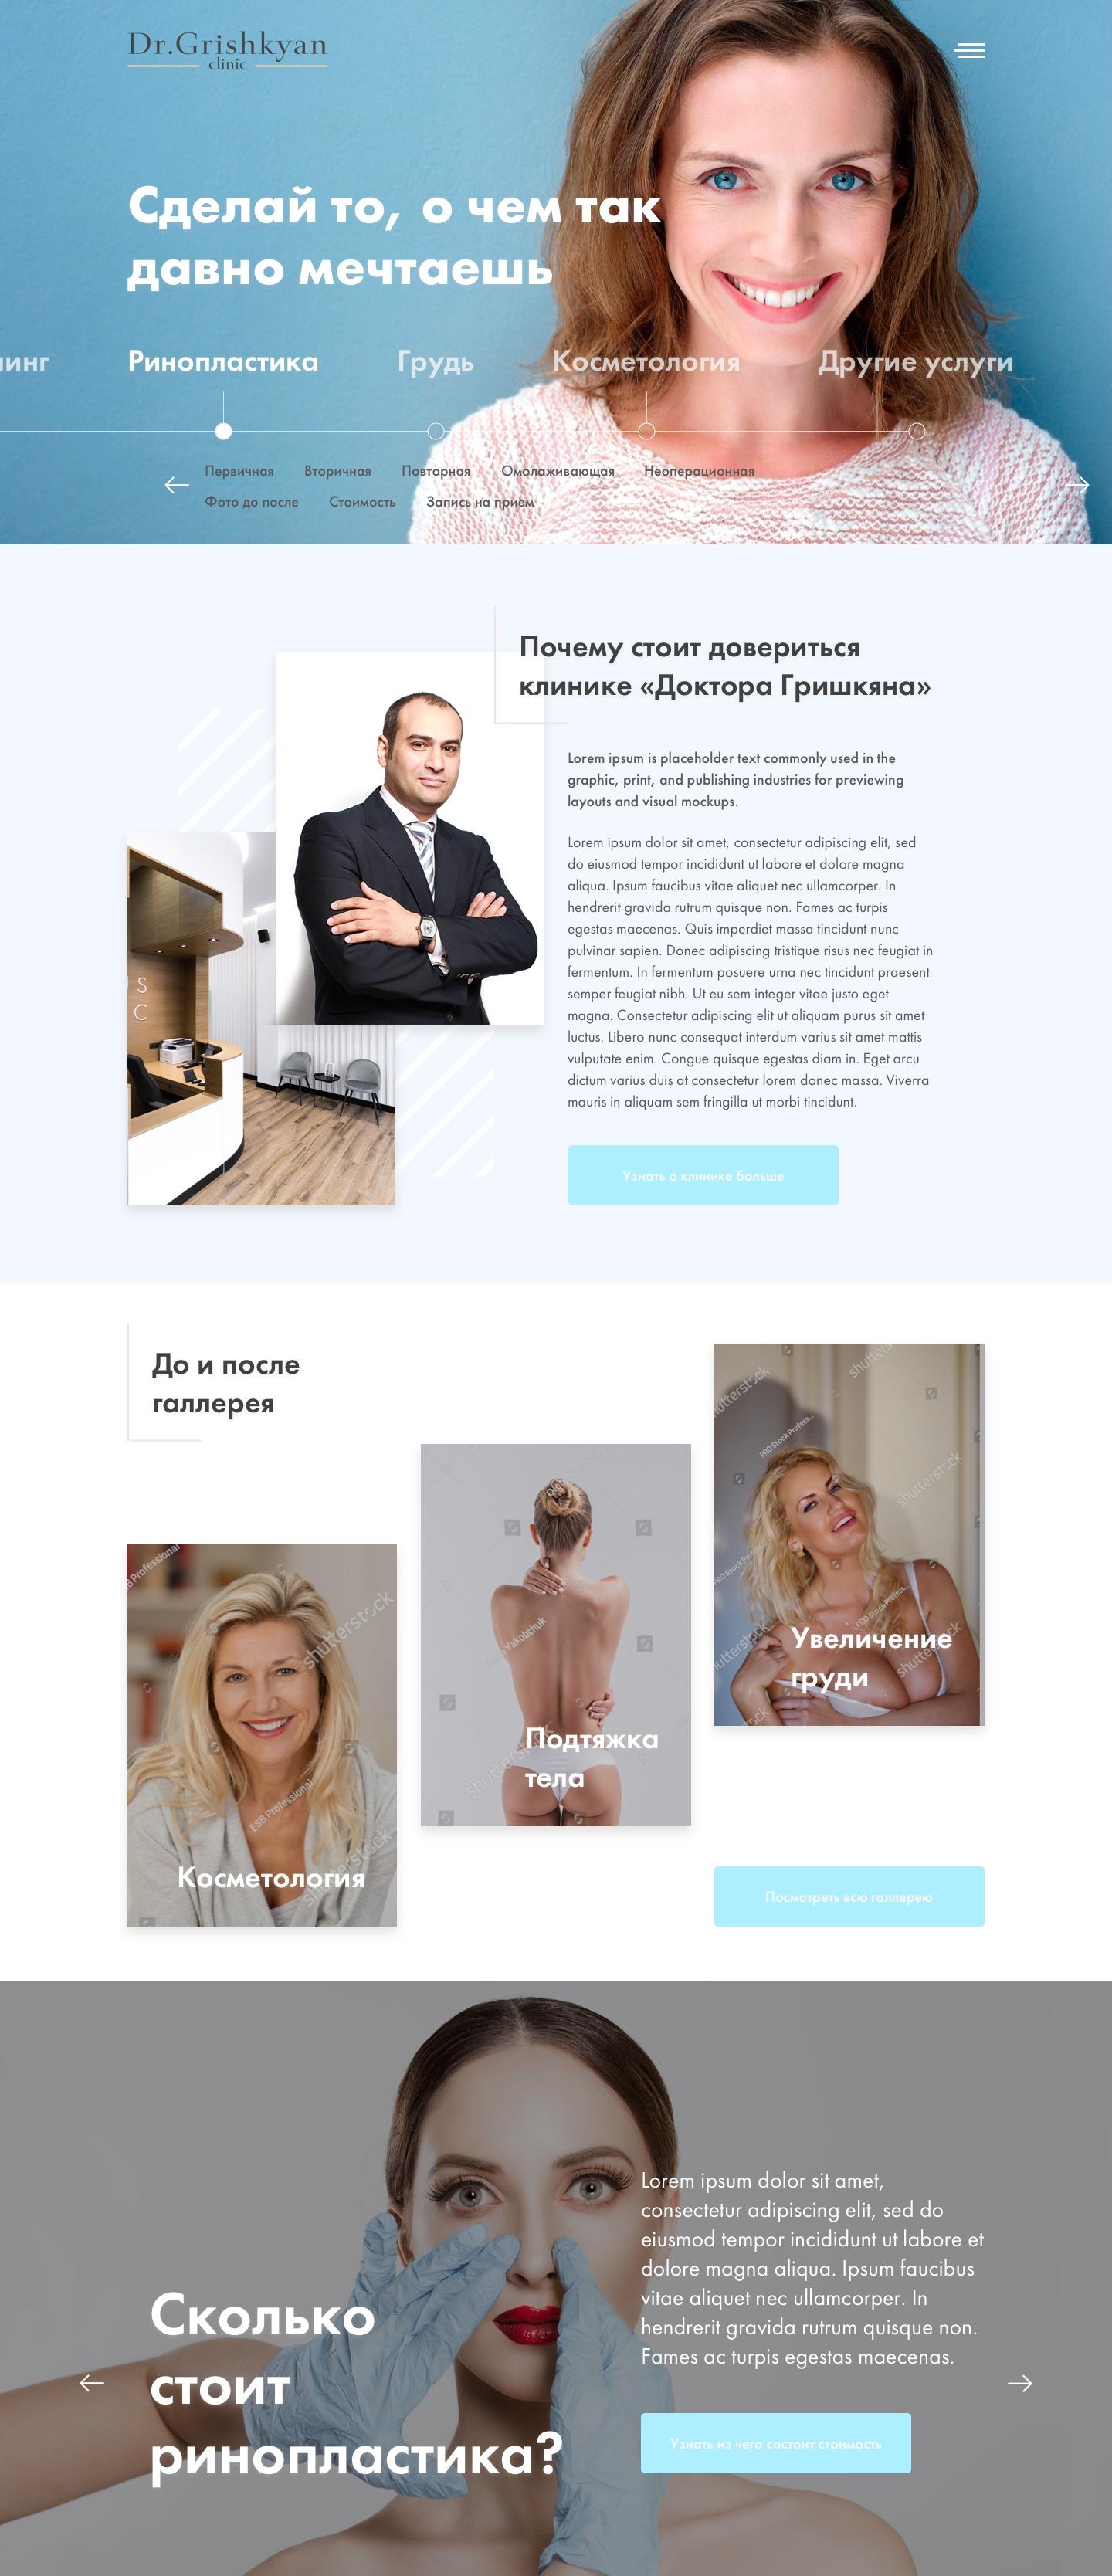 Разработка дизайн концепта главной страницы сайта. фото f_3995c93ea4a610f4.jpg